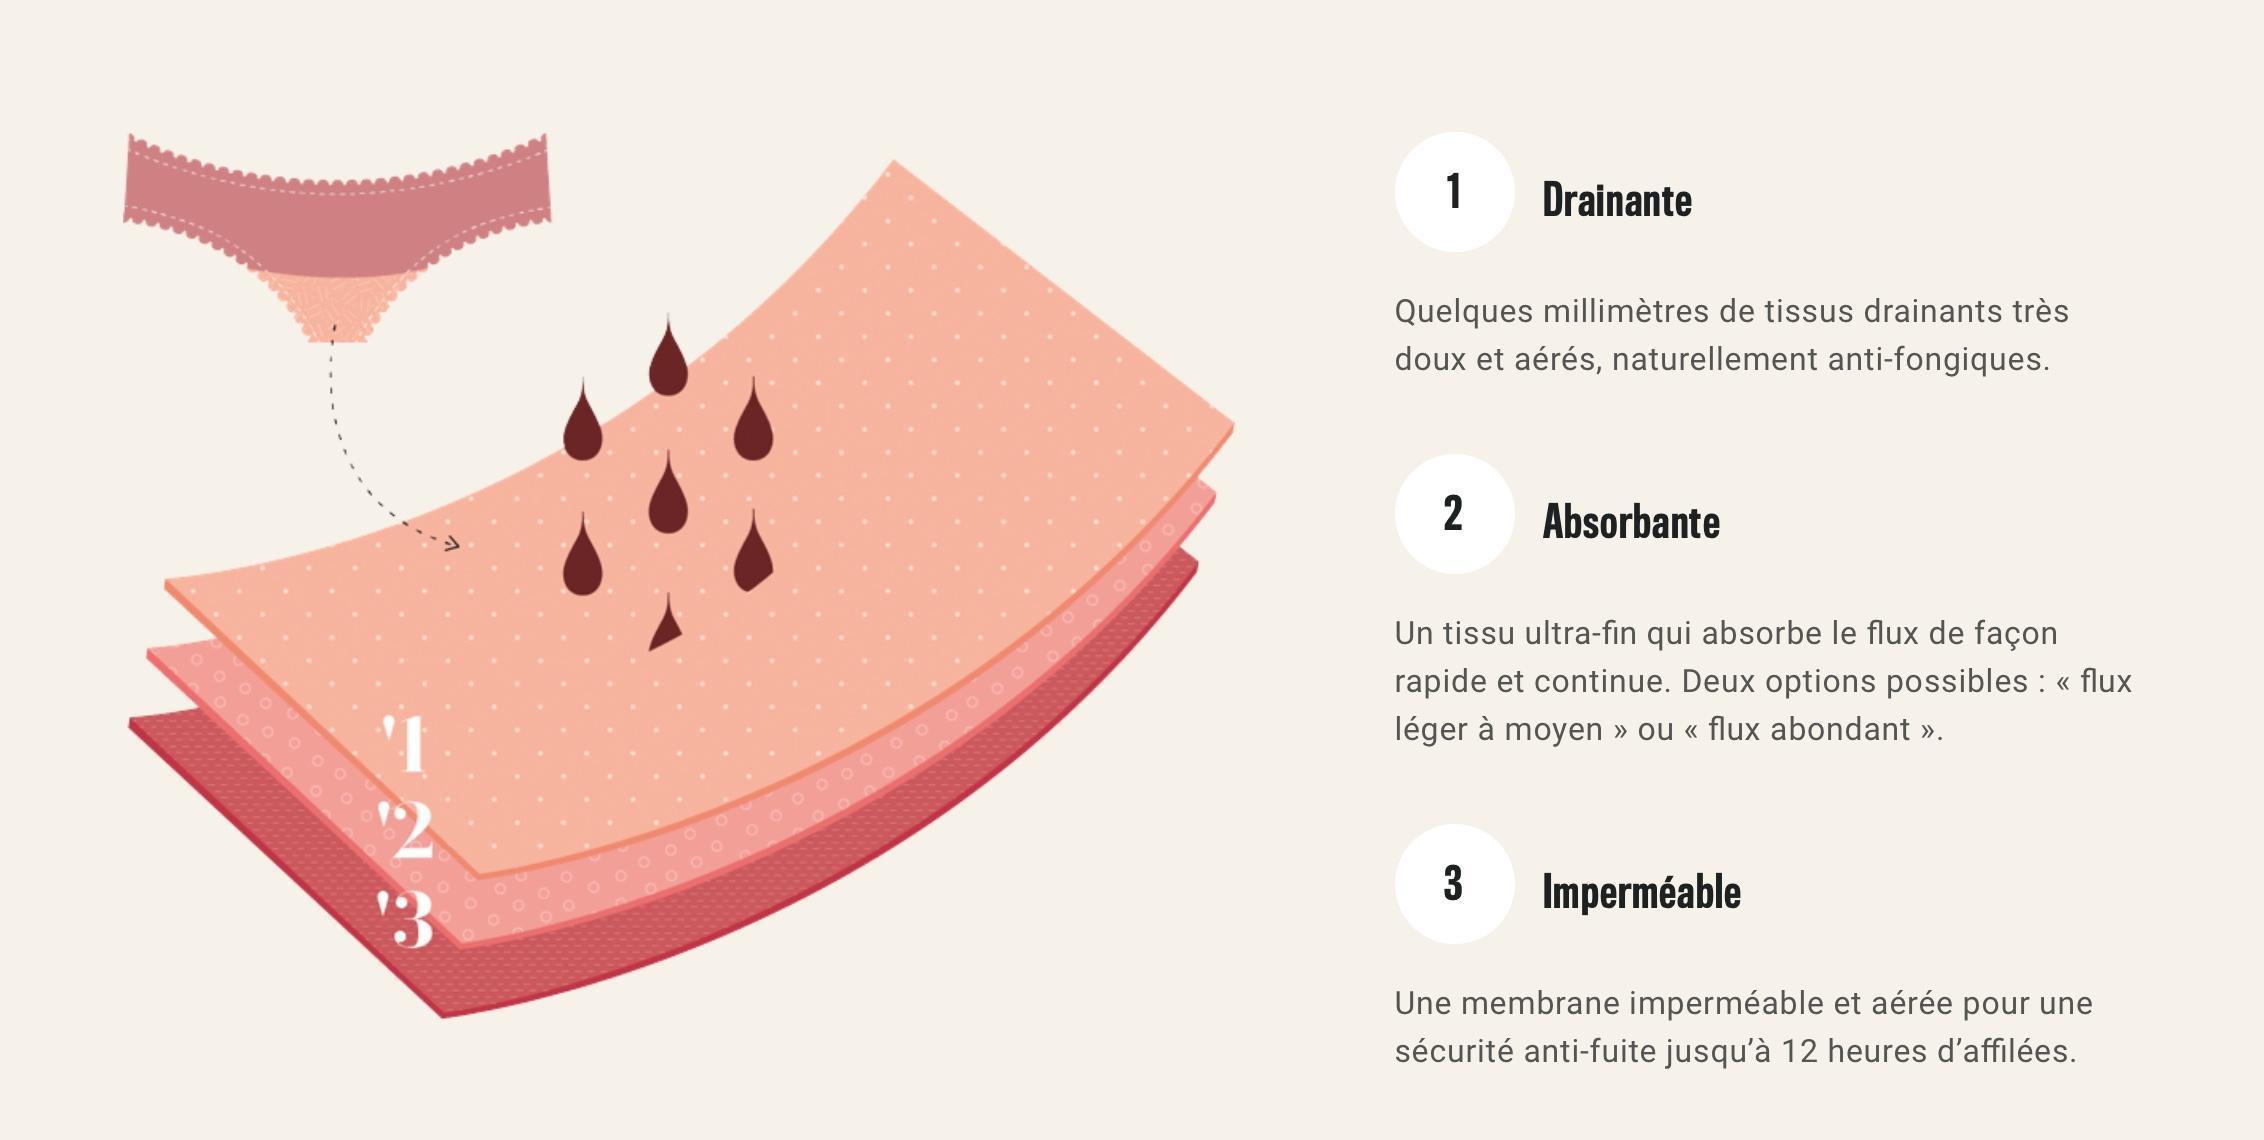 Les différentes couches qui composent les culottes menstruelles